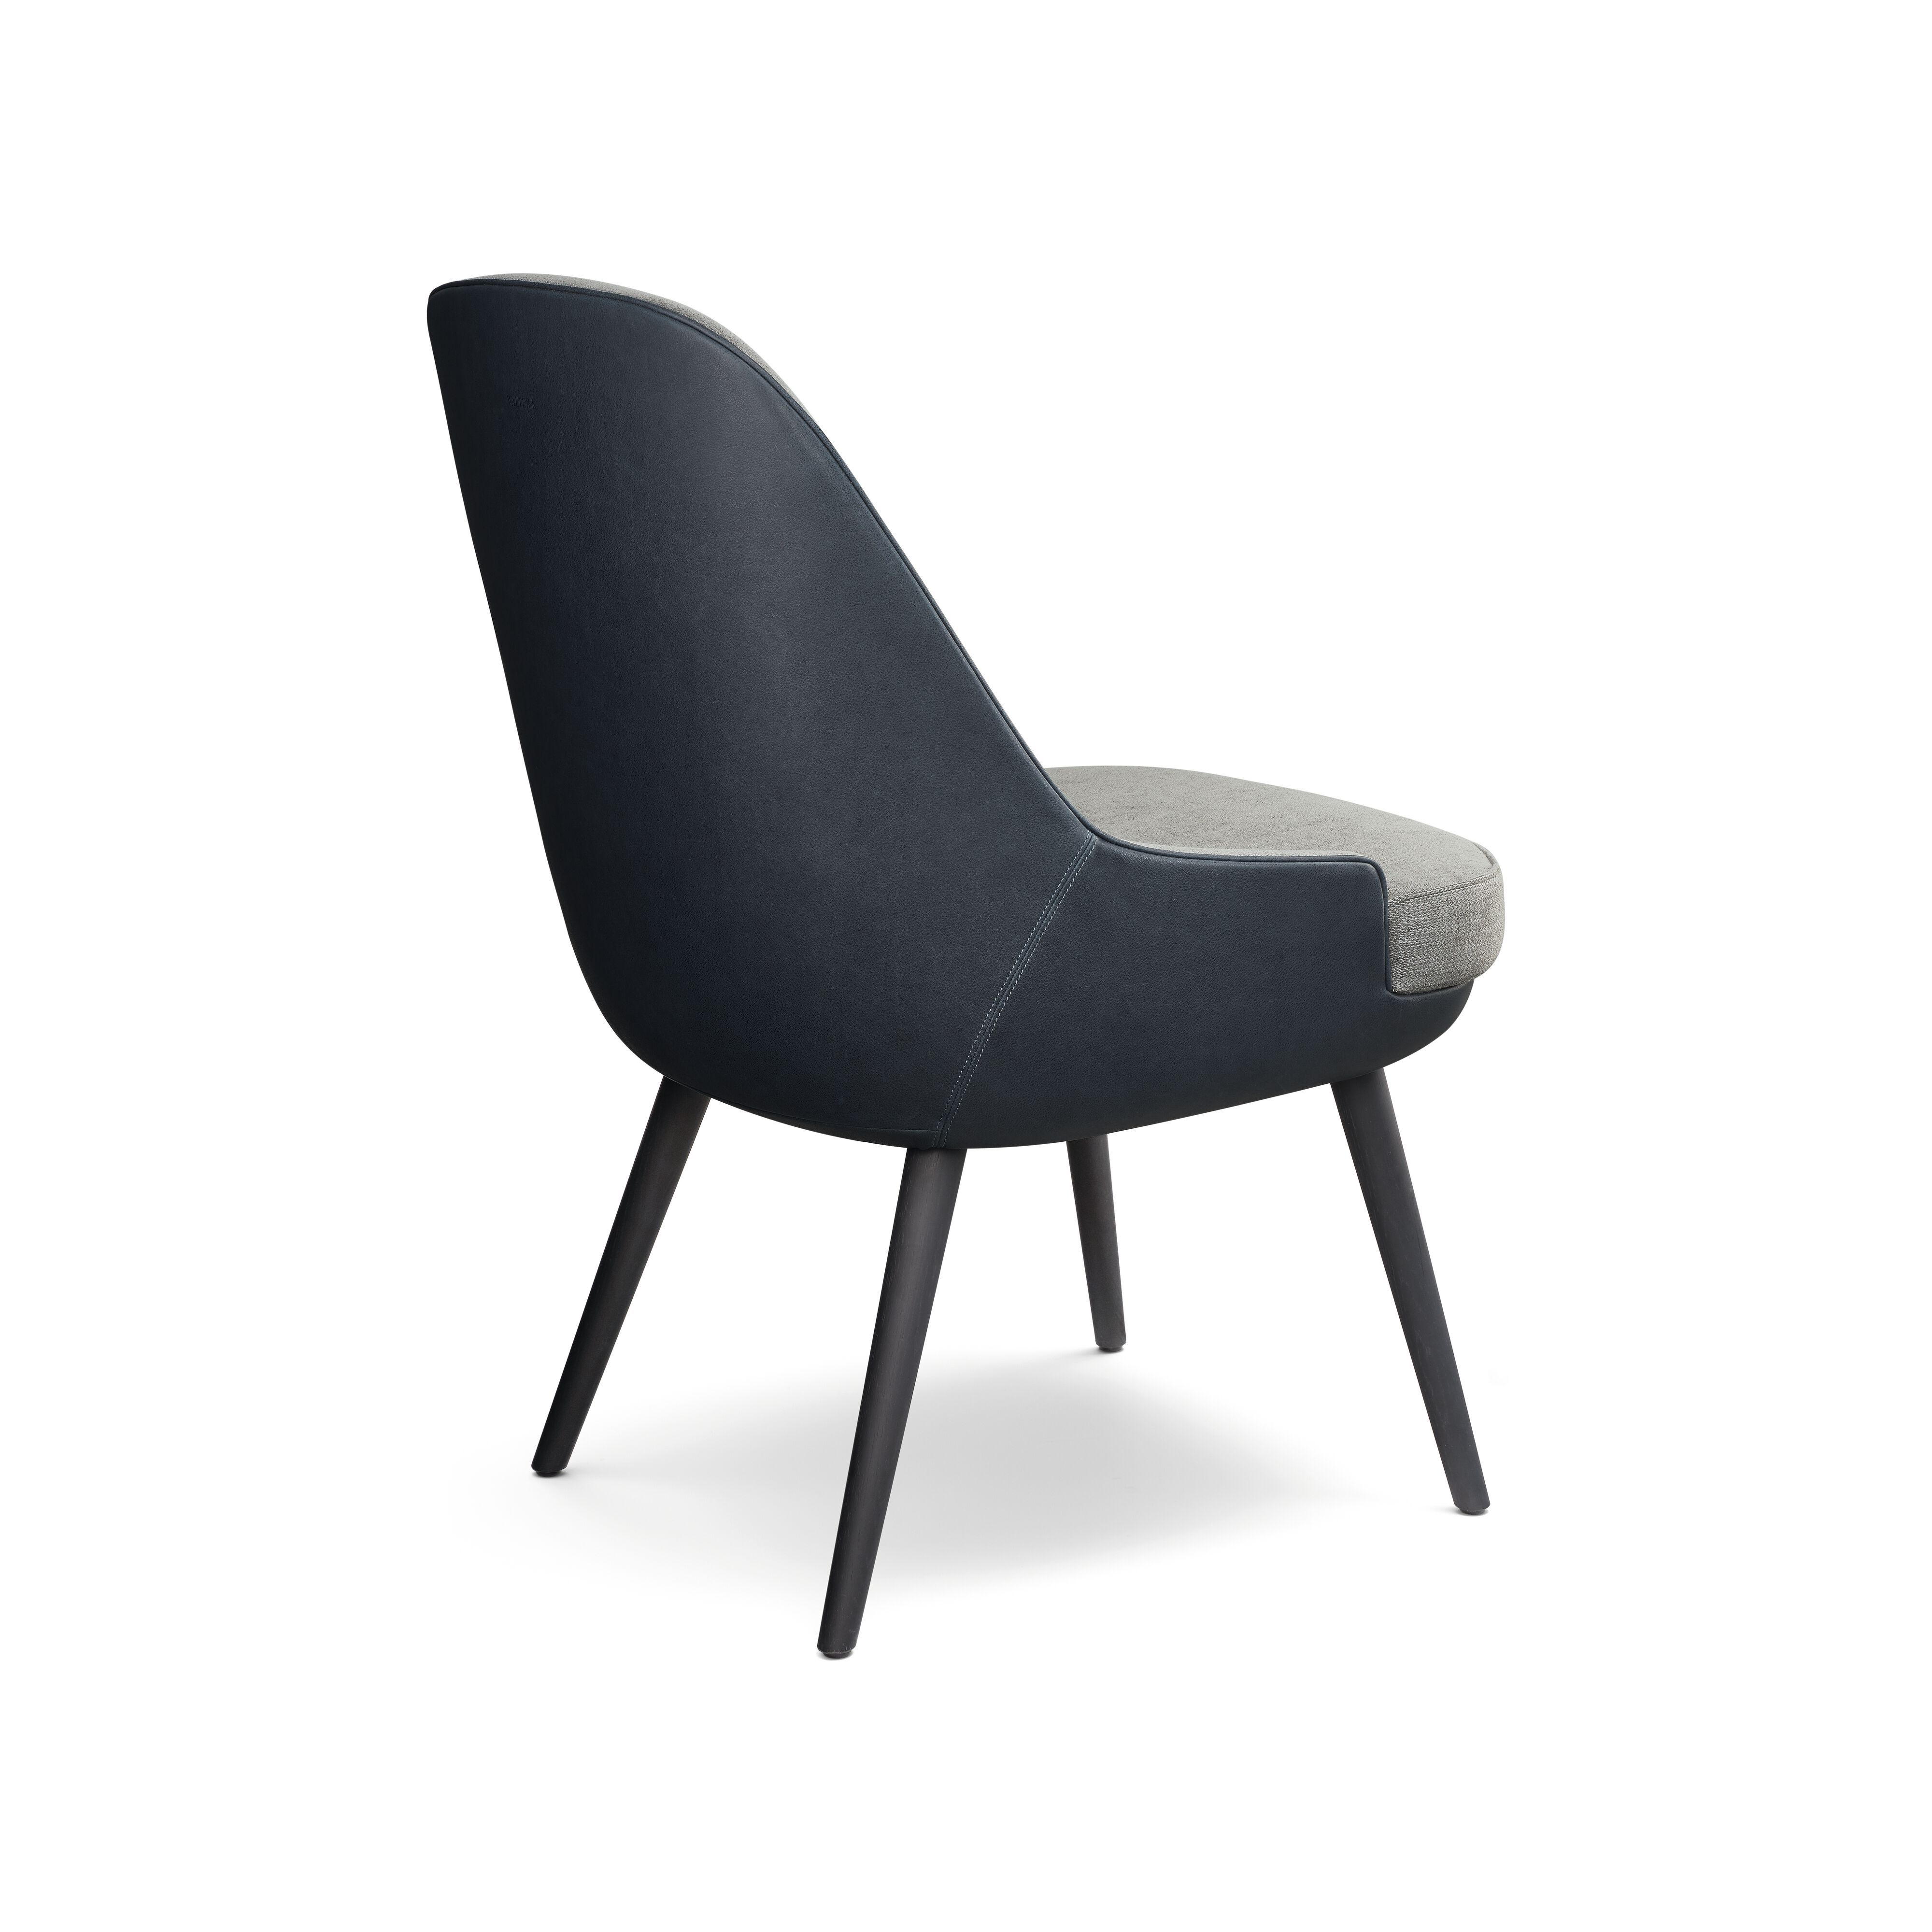 11_Walter-K_WK-375_Chair-Modell-1375-C-0005_Walter K-H.tif